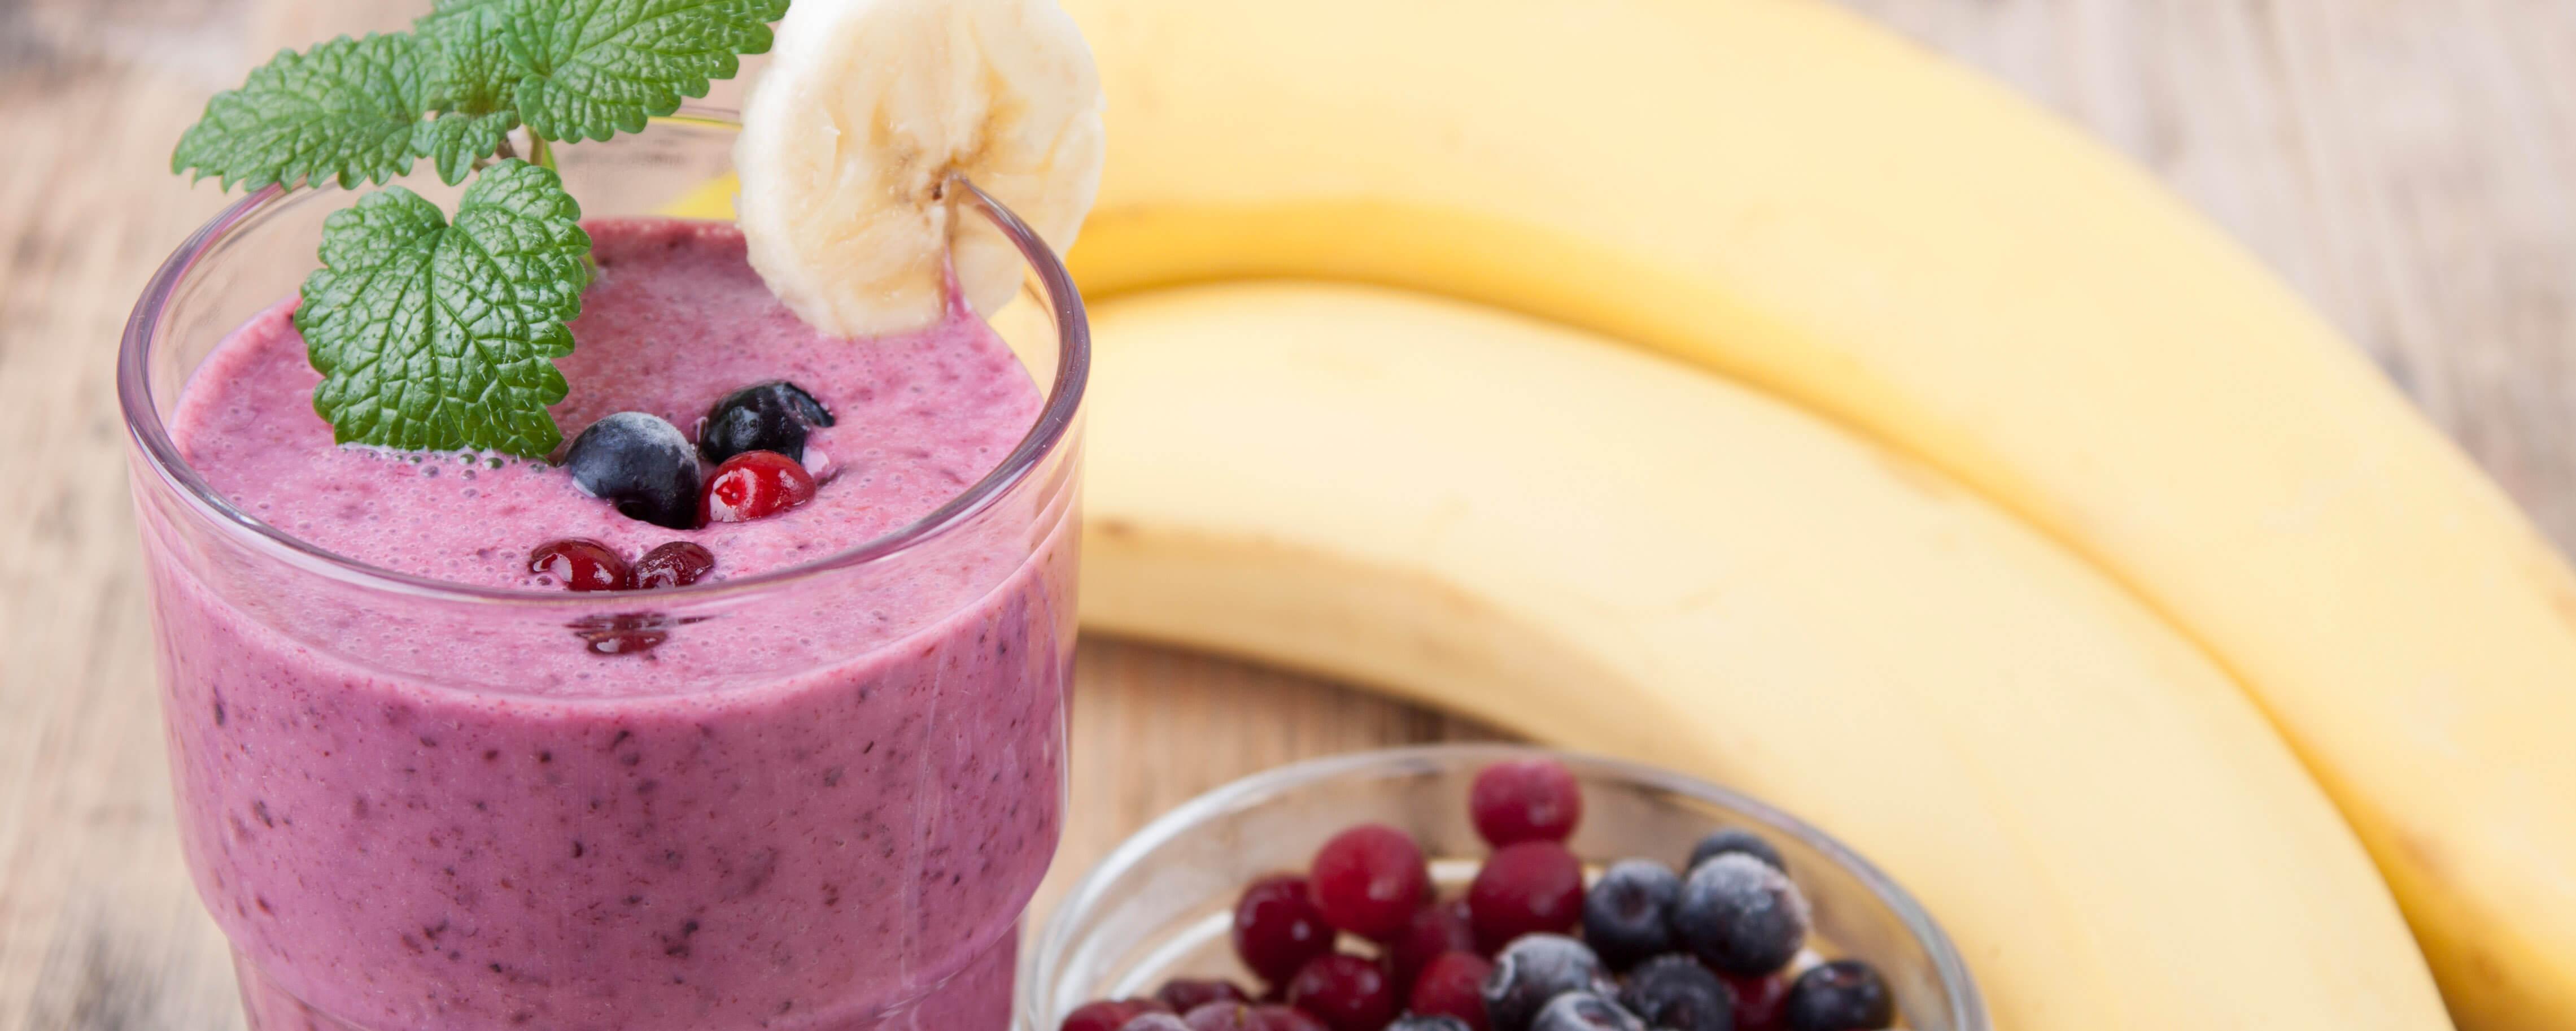 Diese Lebensmittel senken den Blutdruck